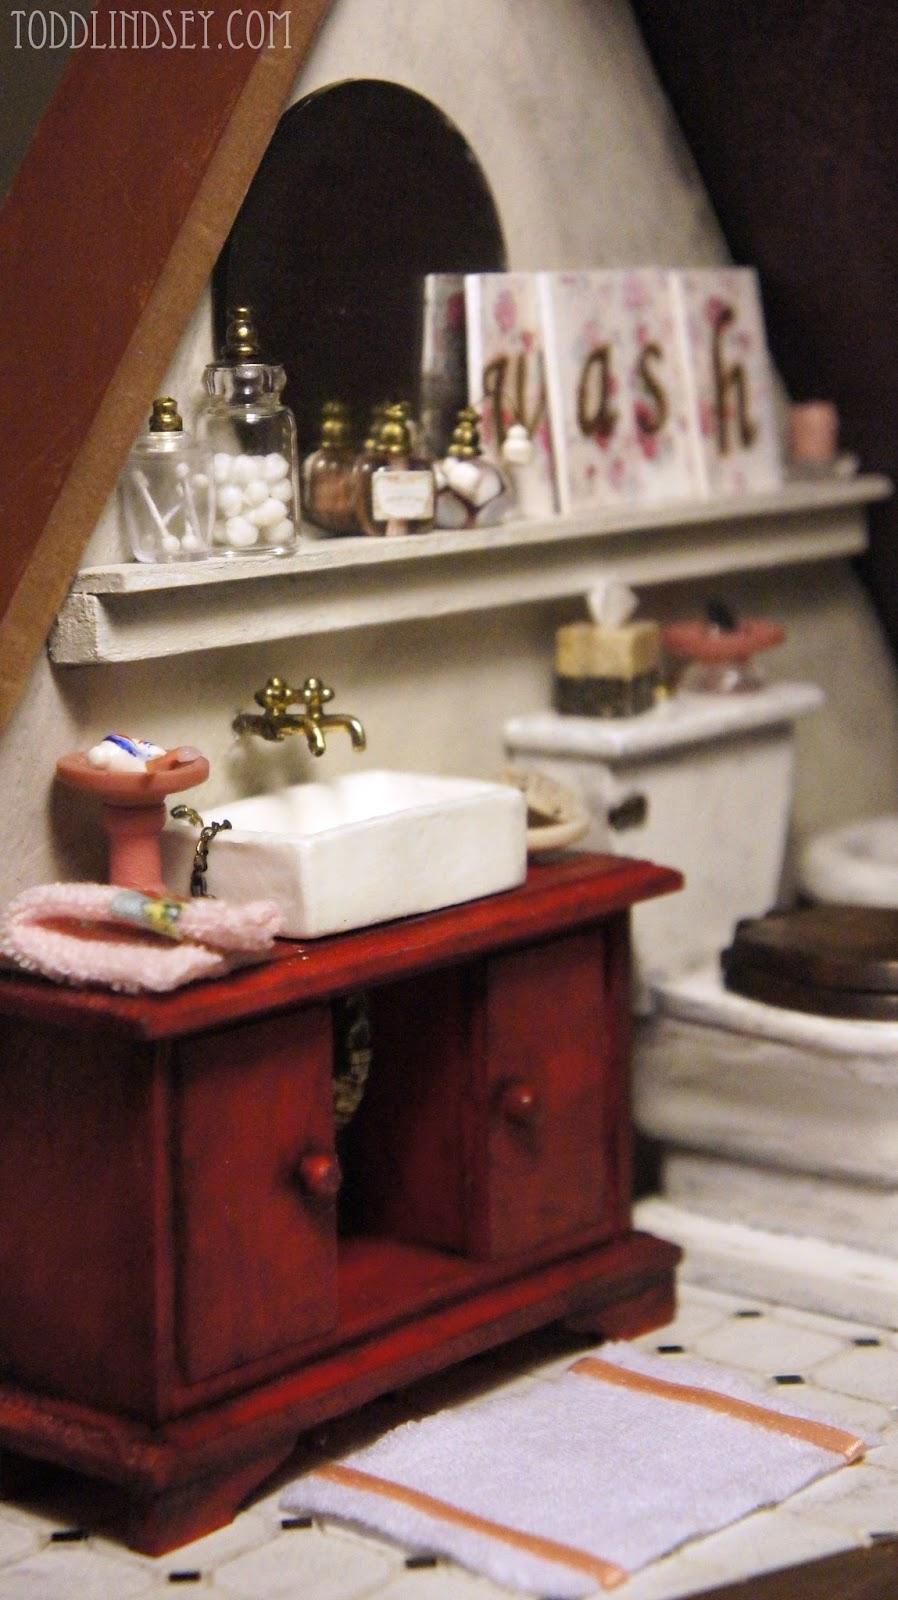 Dollhouse Bathroom Reveal. Todd  amp  Lindsey  Dollhouse Bathroom Reveal